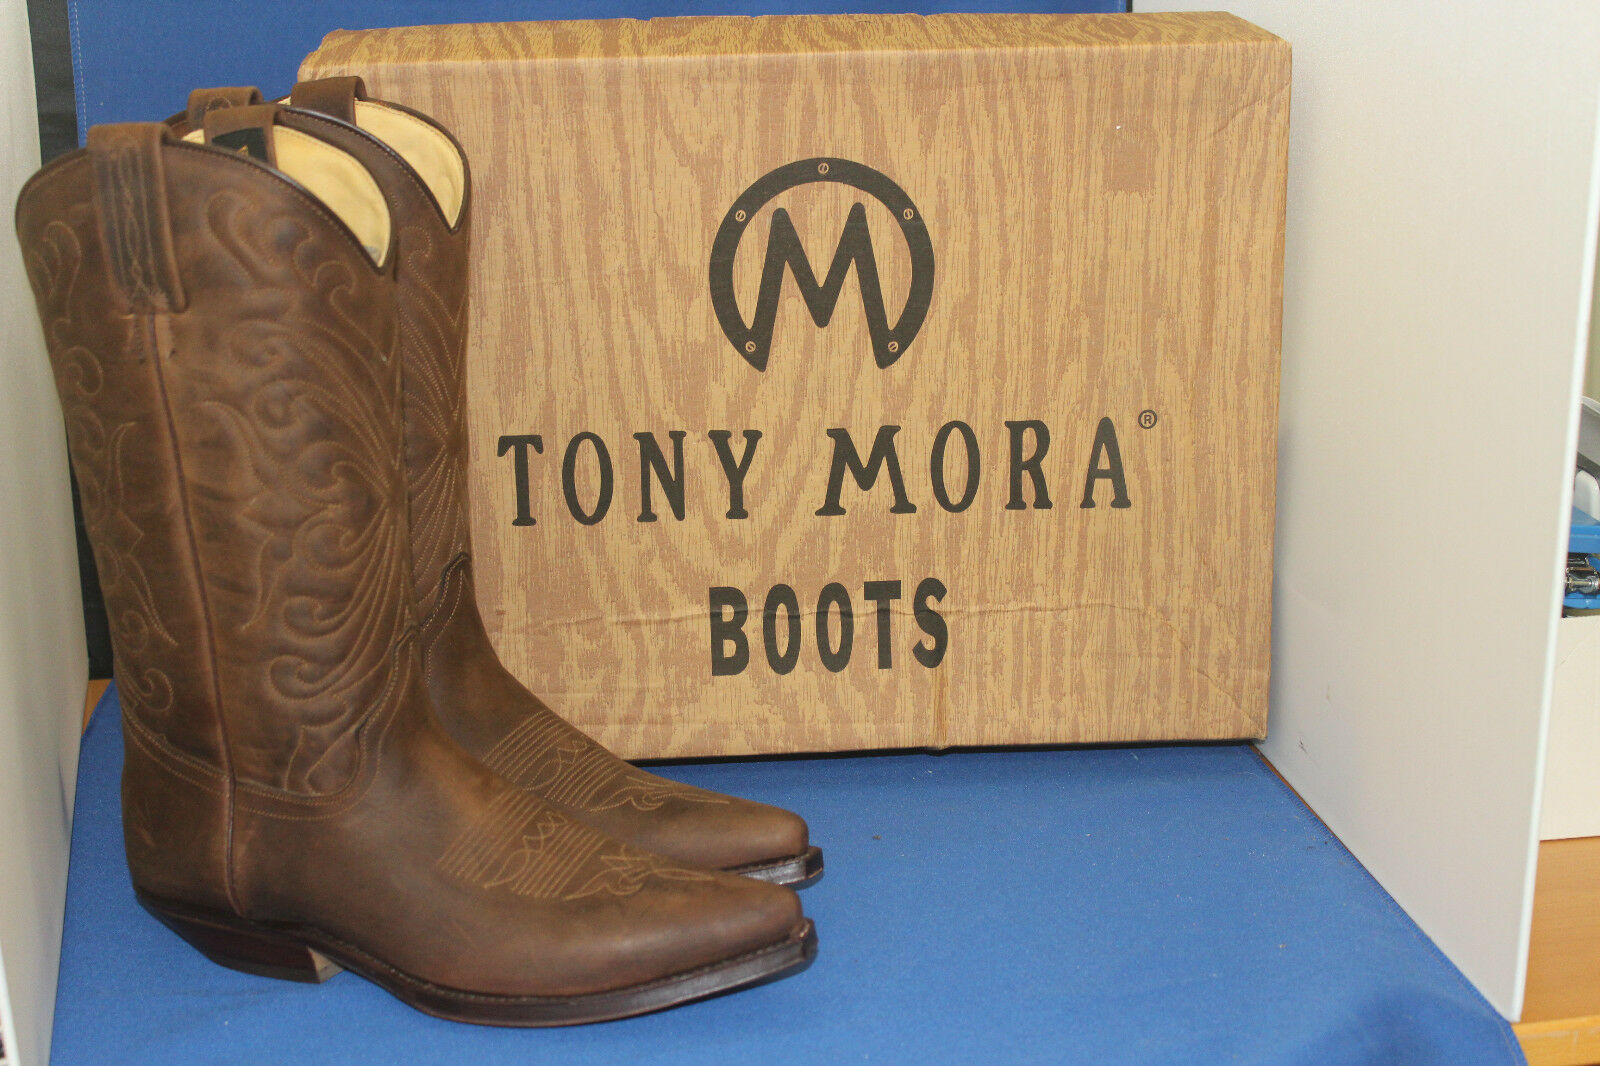 Tony mora  Stiefel westernStiefel cowboystiefel  stiefel elegant  braun neu gr. 41